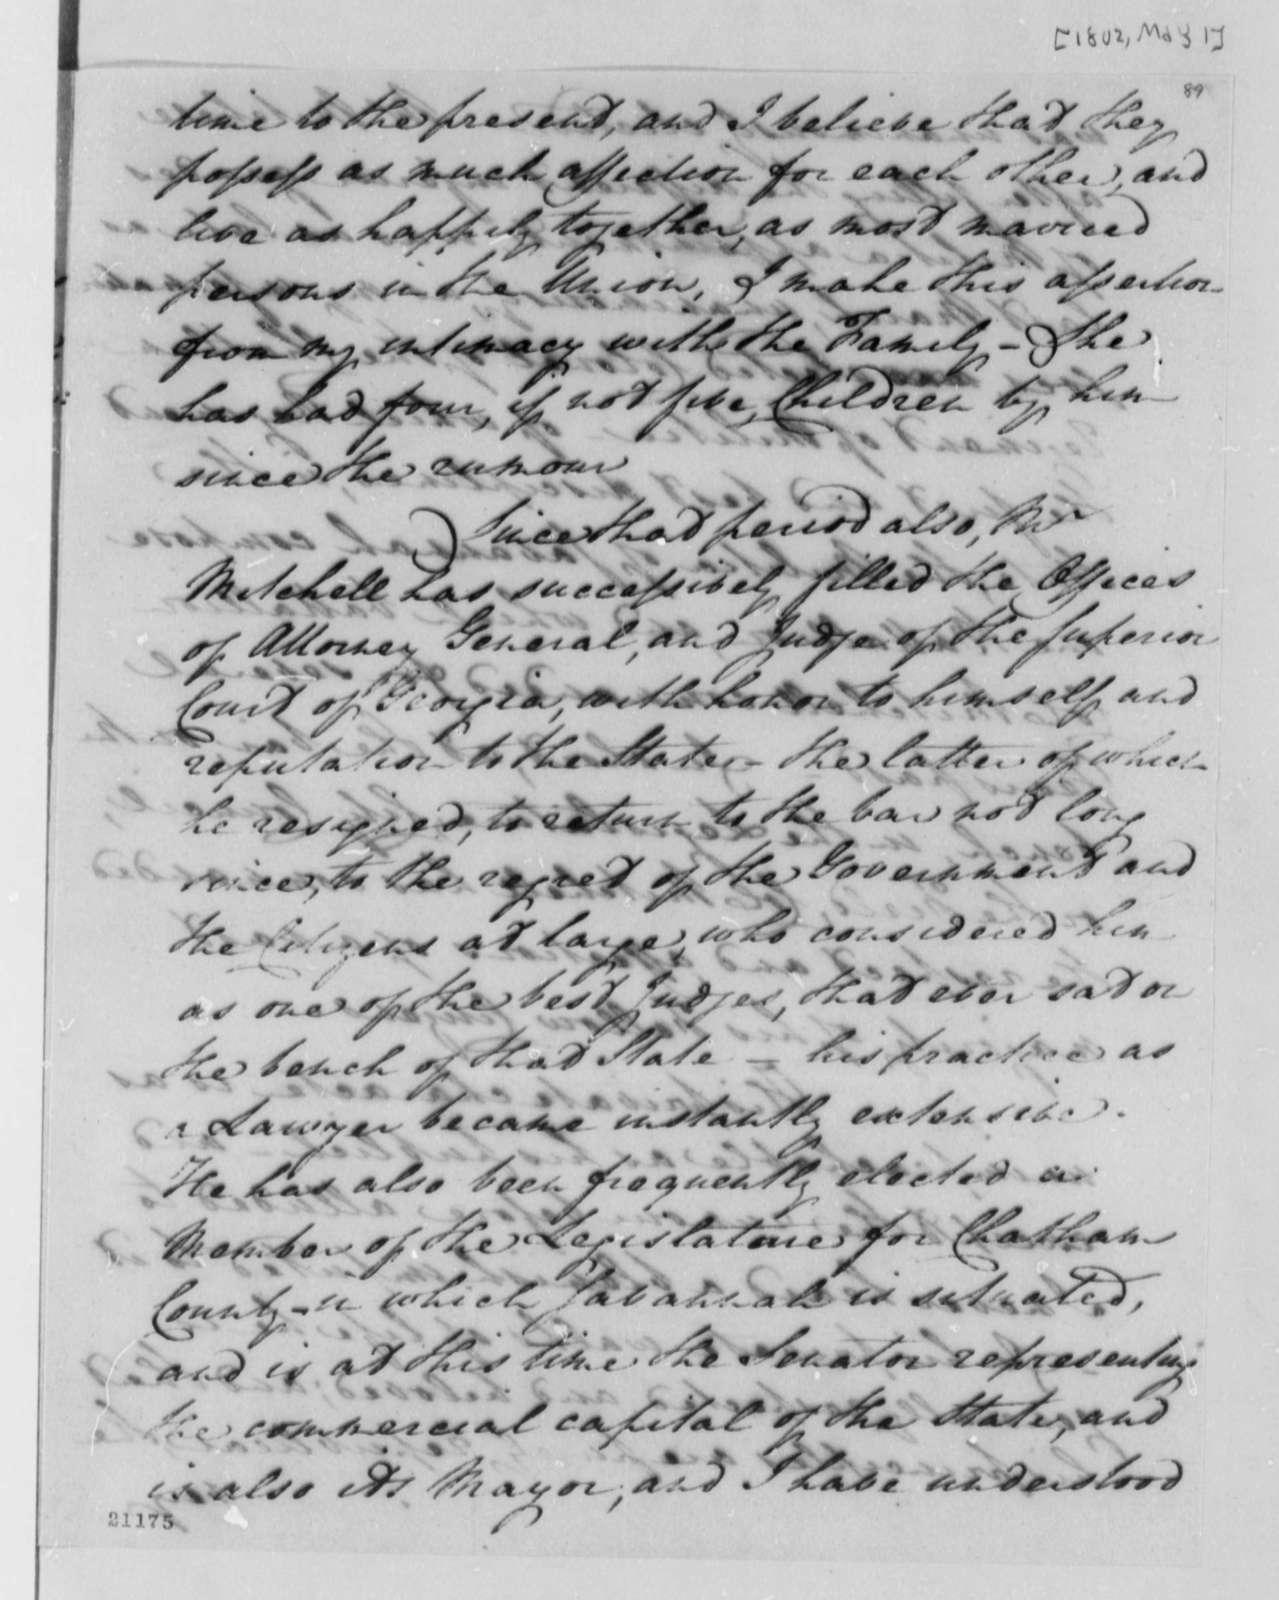 James Jackson to Thomas Jefferson, May 1, 1802